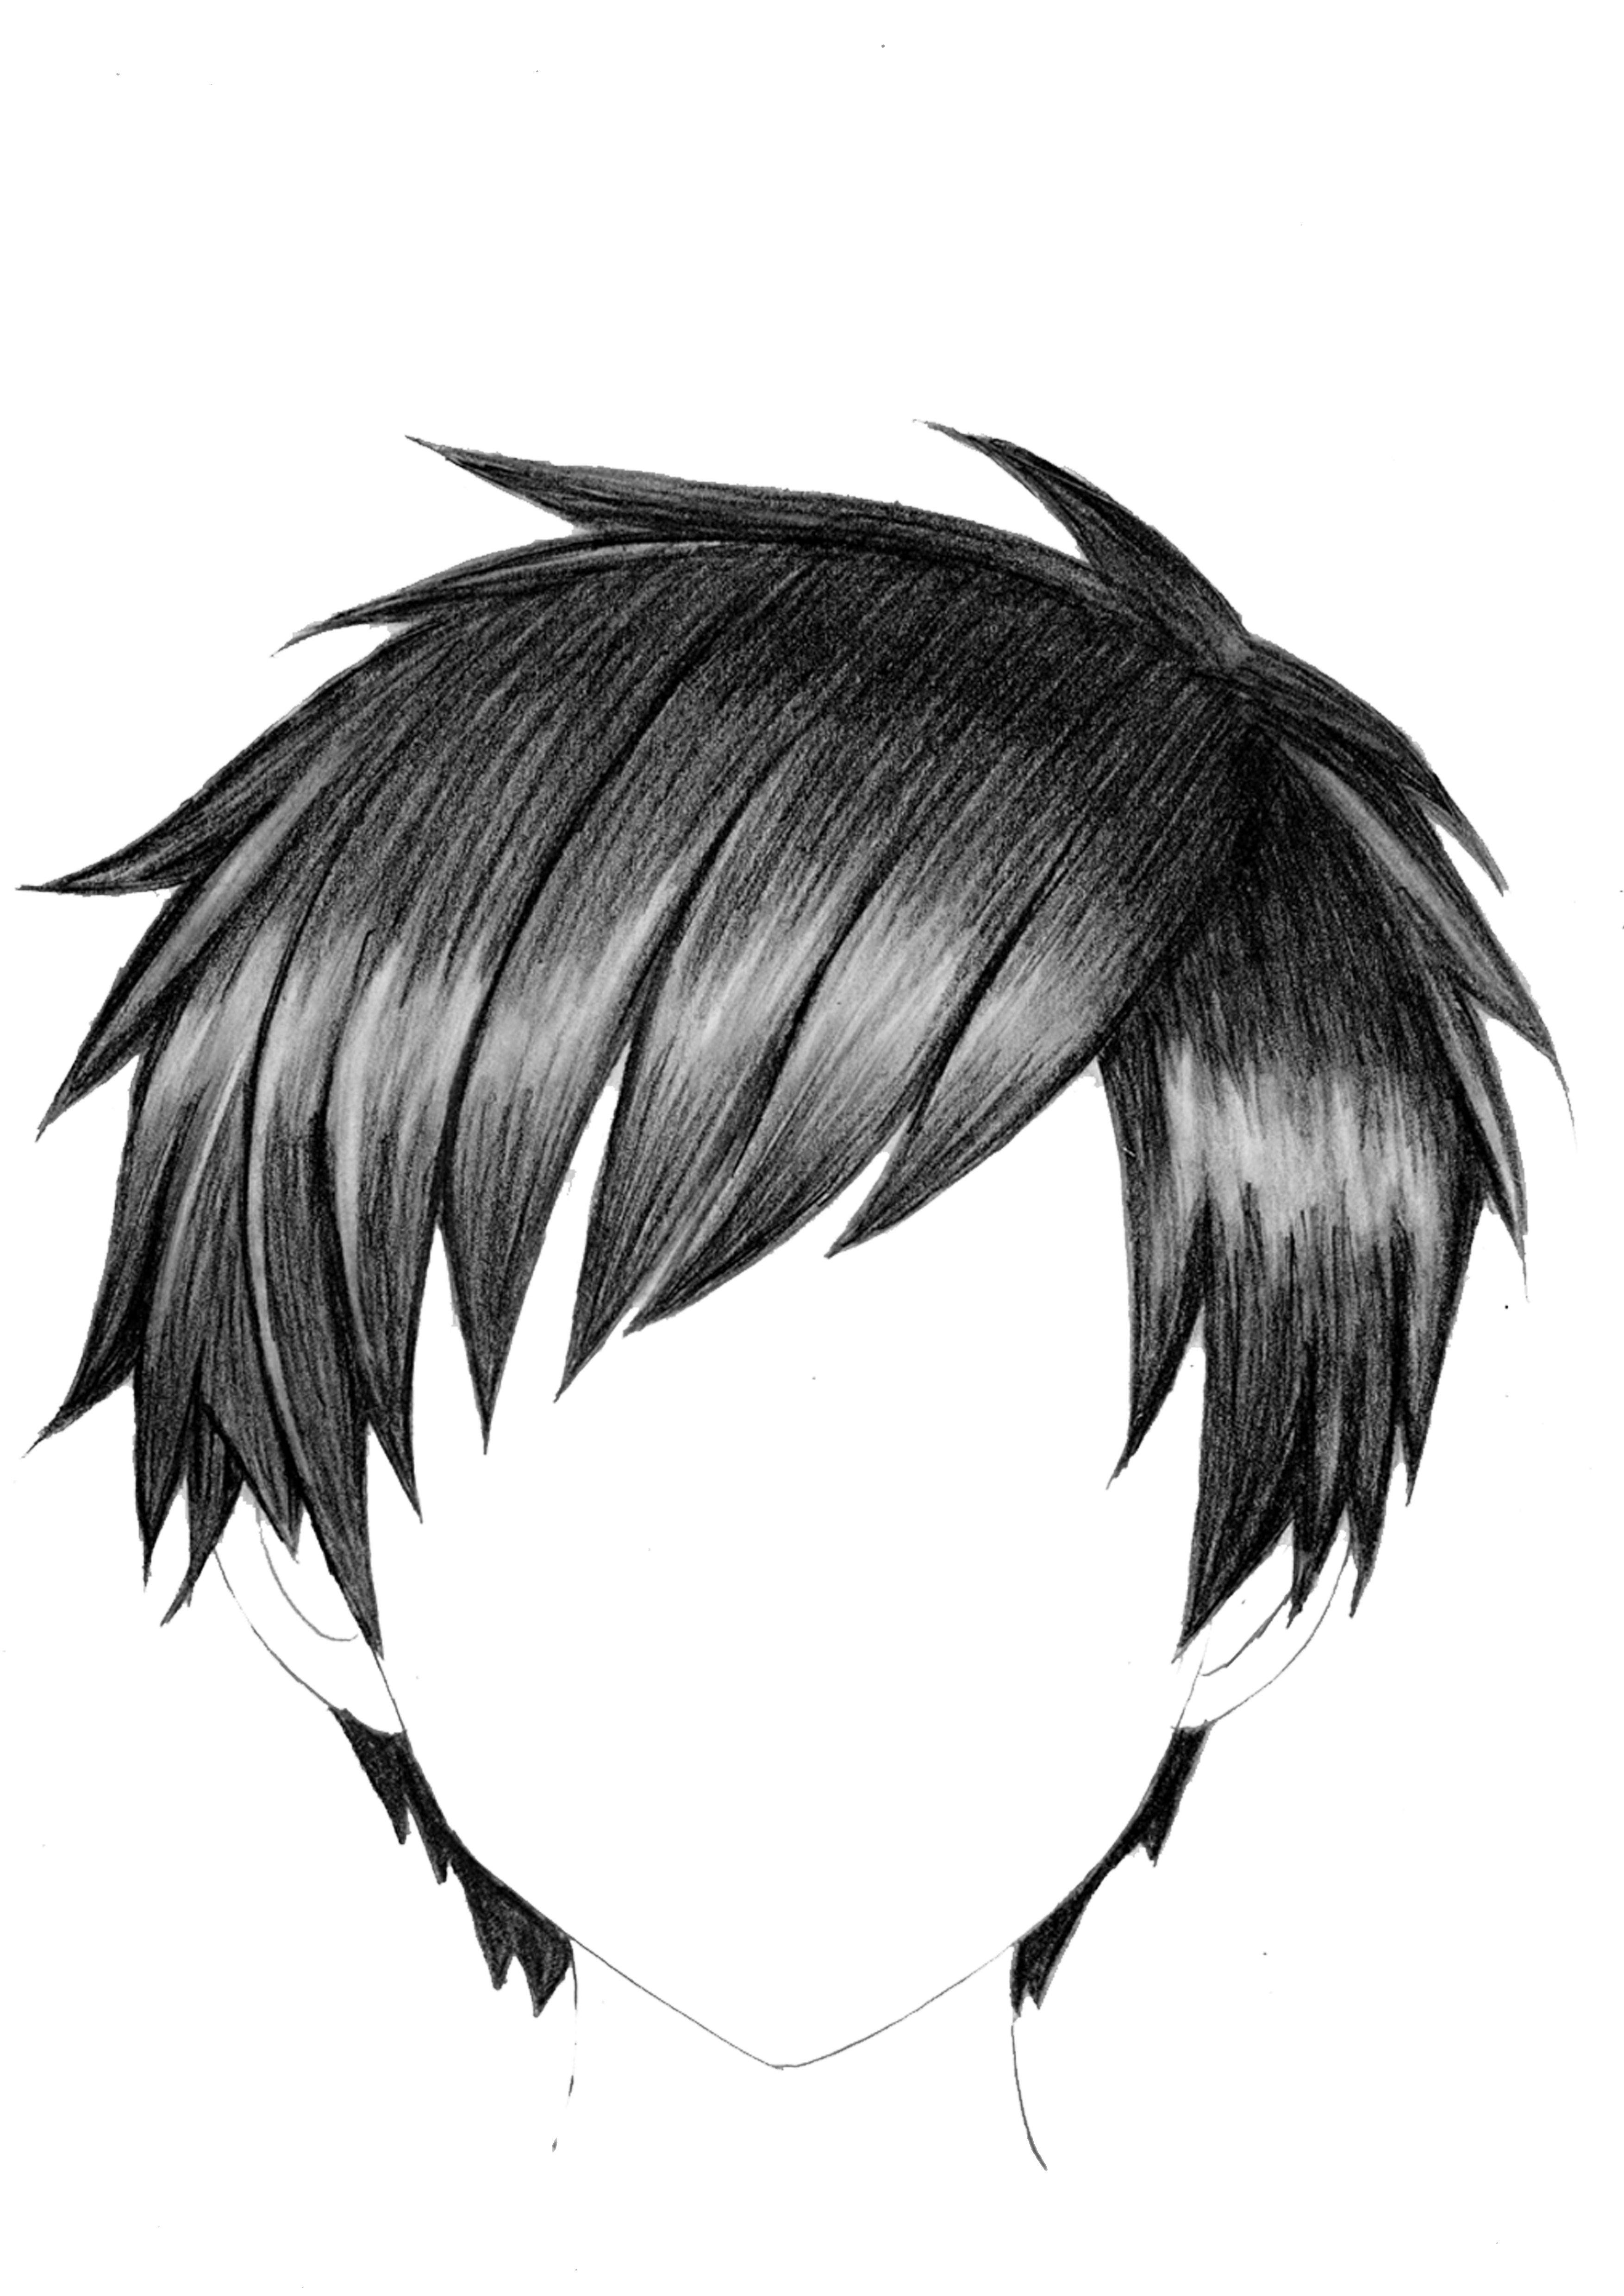 How To Draw Anime Boy Hair Draw Realistic Anime Hair In 2020 Anime Boy Hair Boy Hair Drawing Anime Drawings